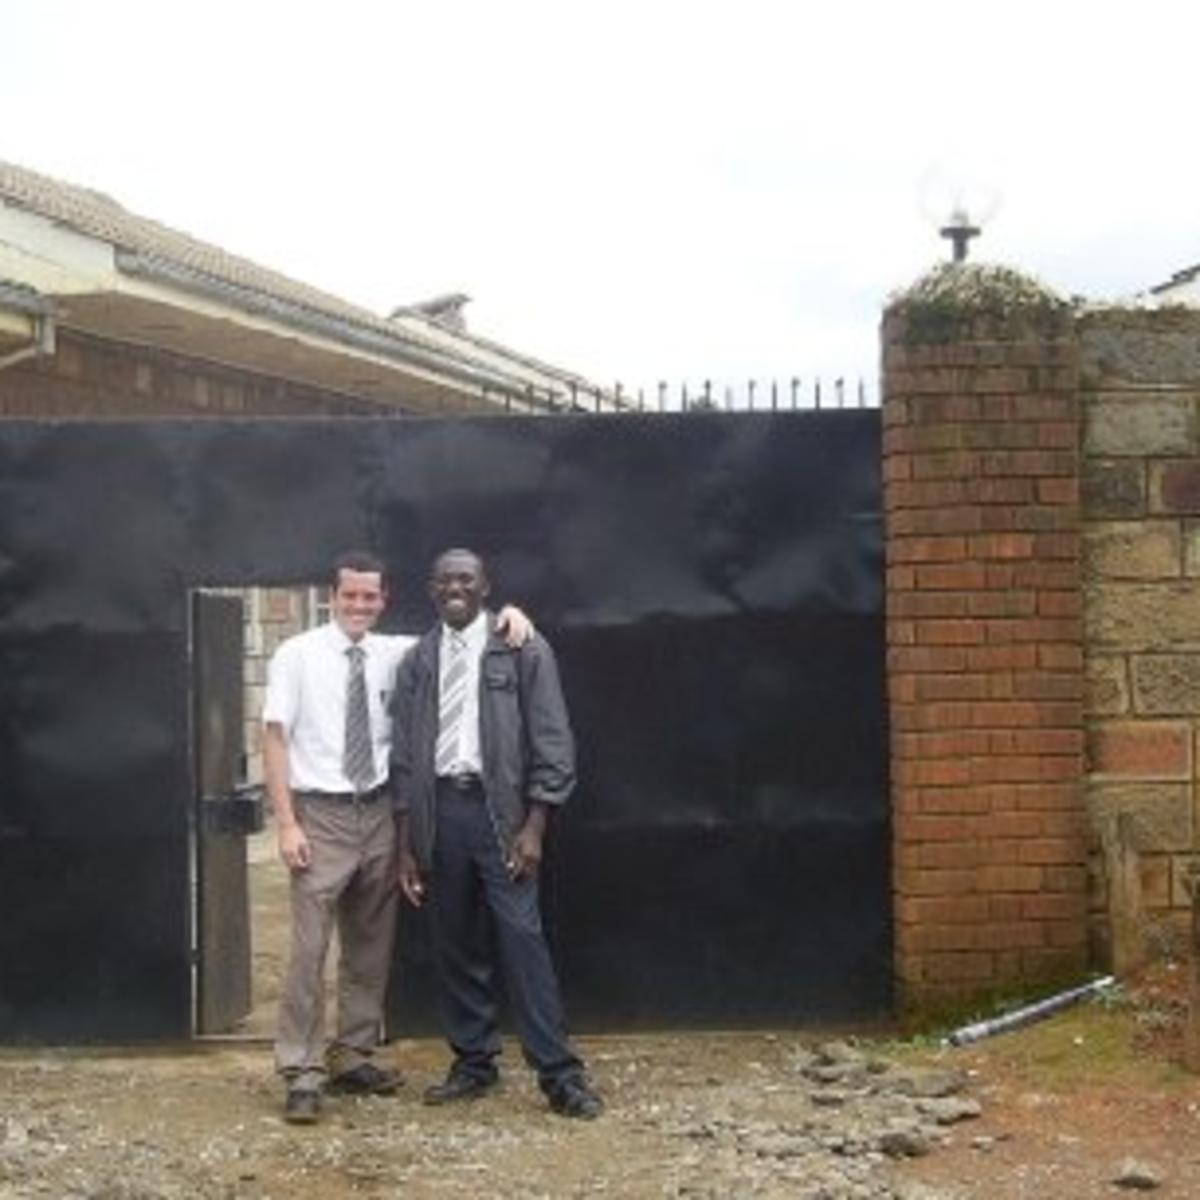 image of missionary at church in Kenya